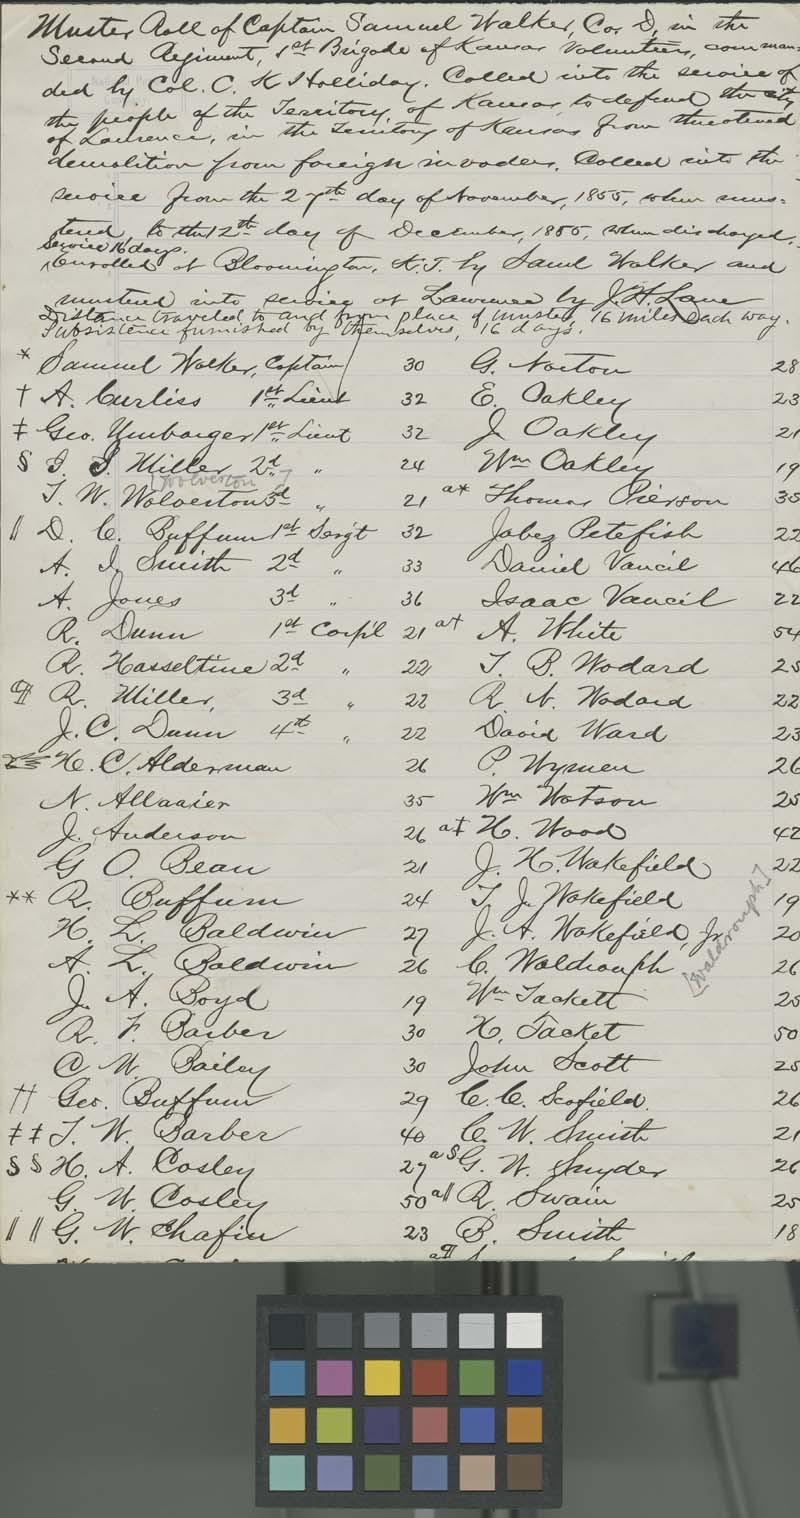 Muster Roll of Captain Samuel Walker, Company D, Second Regiment, 1st Brigade, Kansas Volunteeers - p. 2